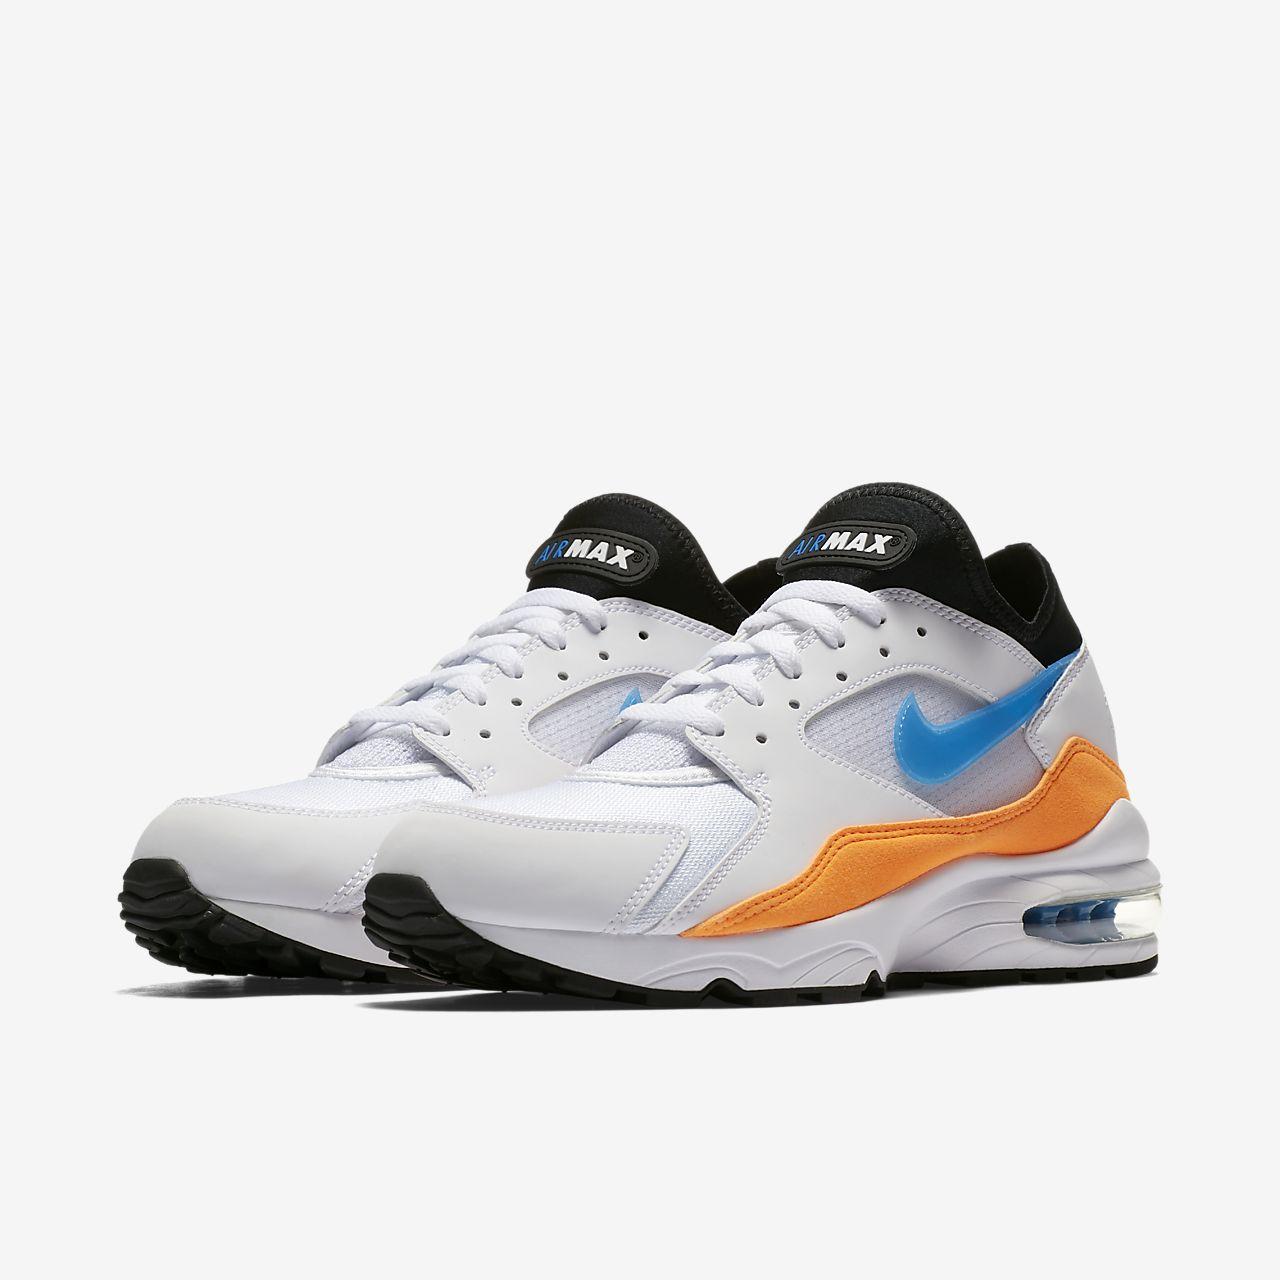 ... Chaussure Nike Air Max 93 pour Homme